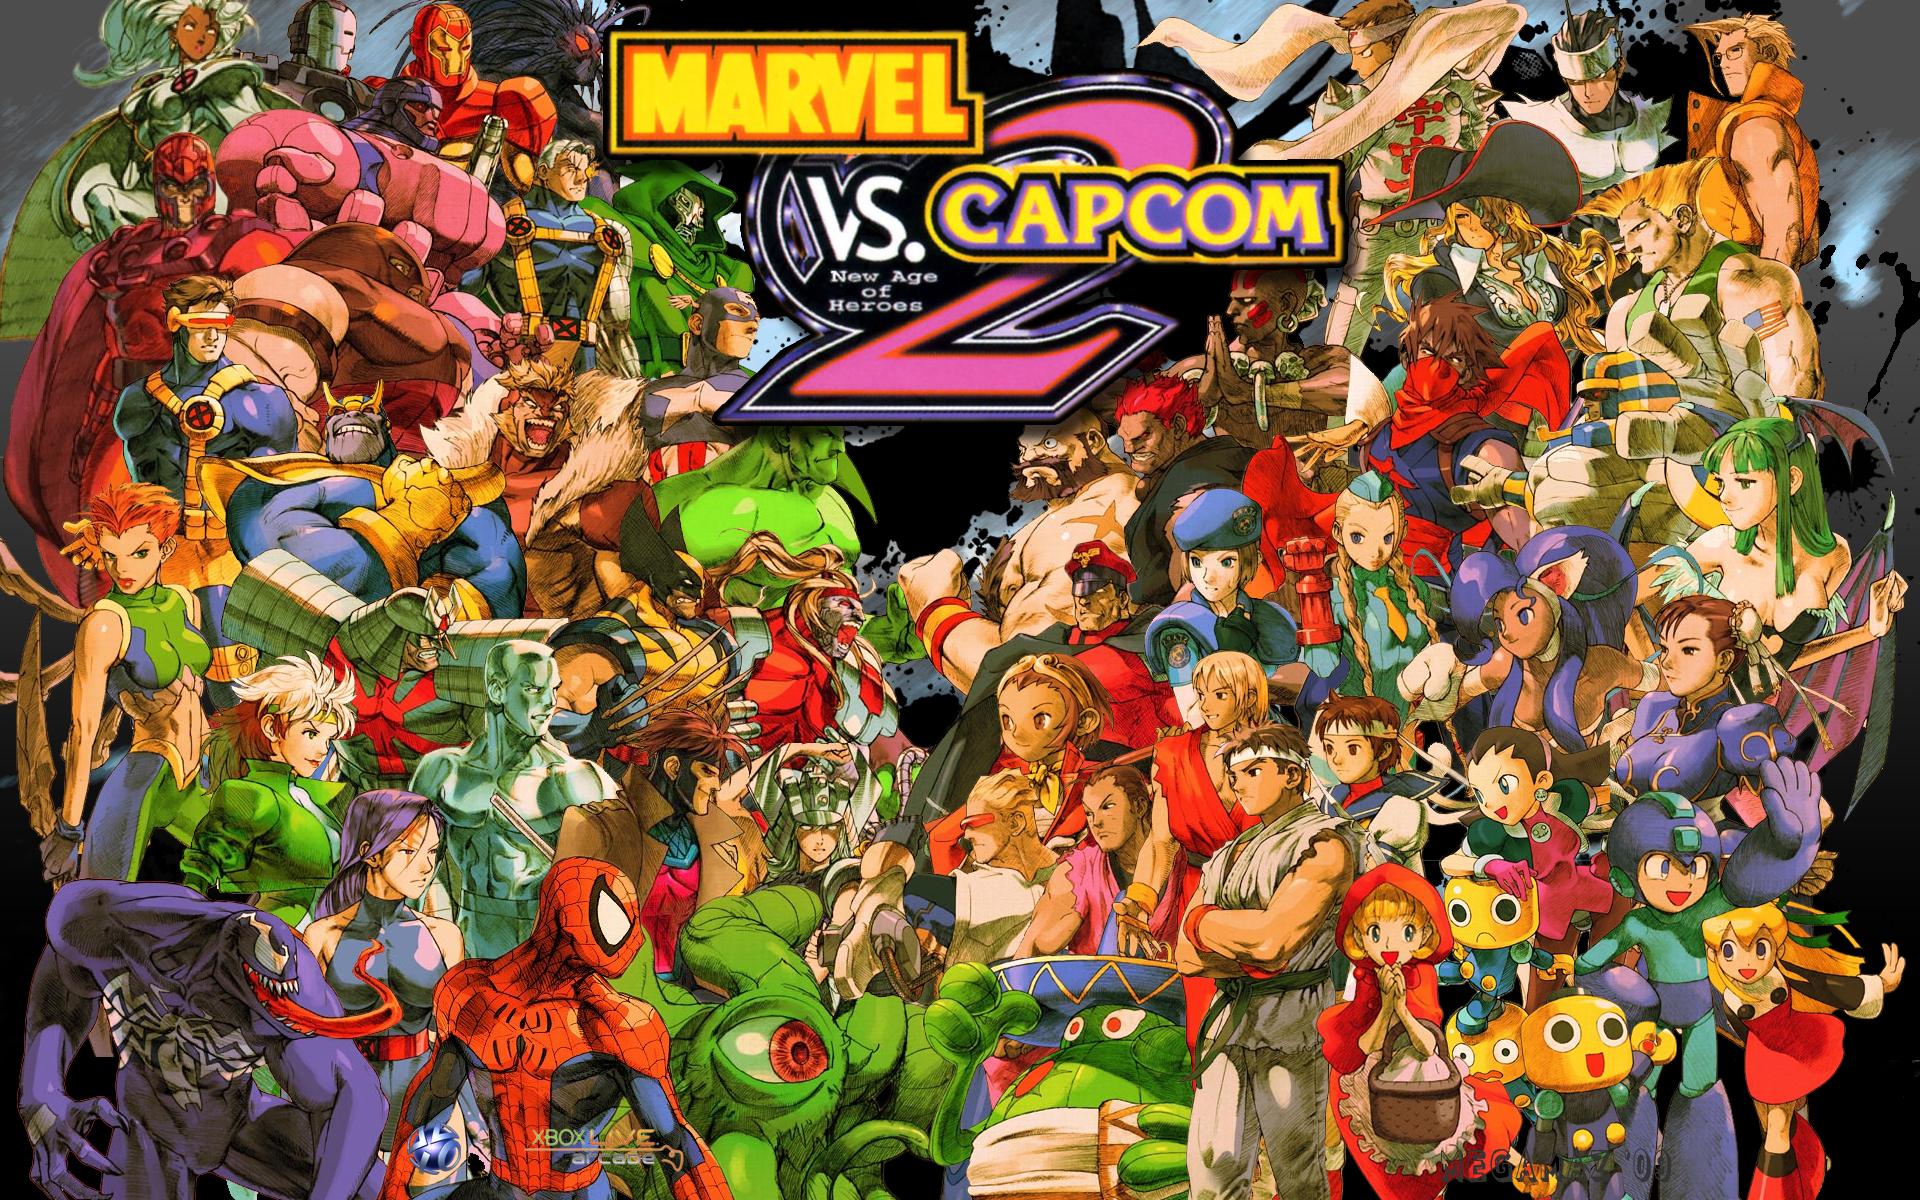 Marvel vs capcom 2 new age of heroes wallpaper capcom database